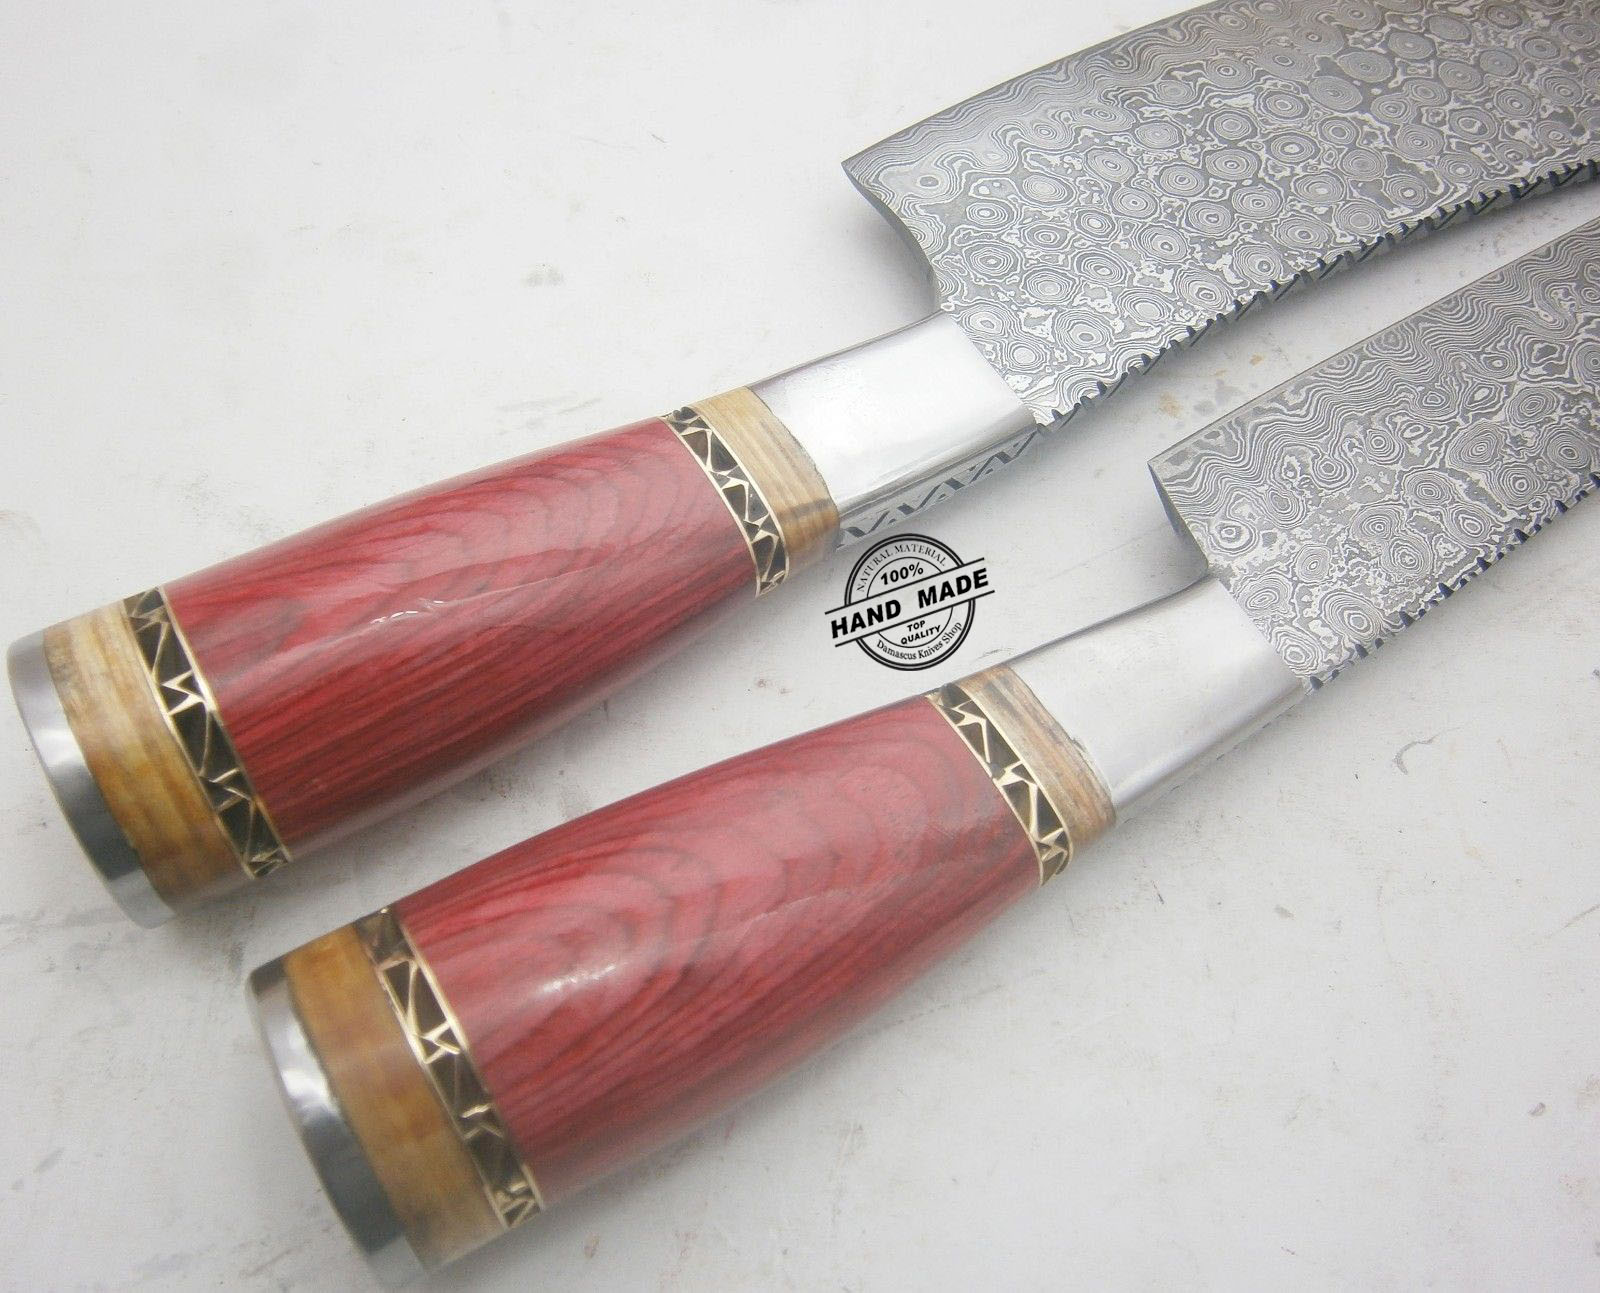 lot of 2 pcs damascus kitchen knife custom handmade damascus steel